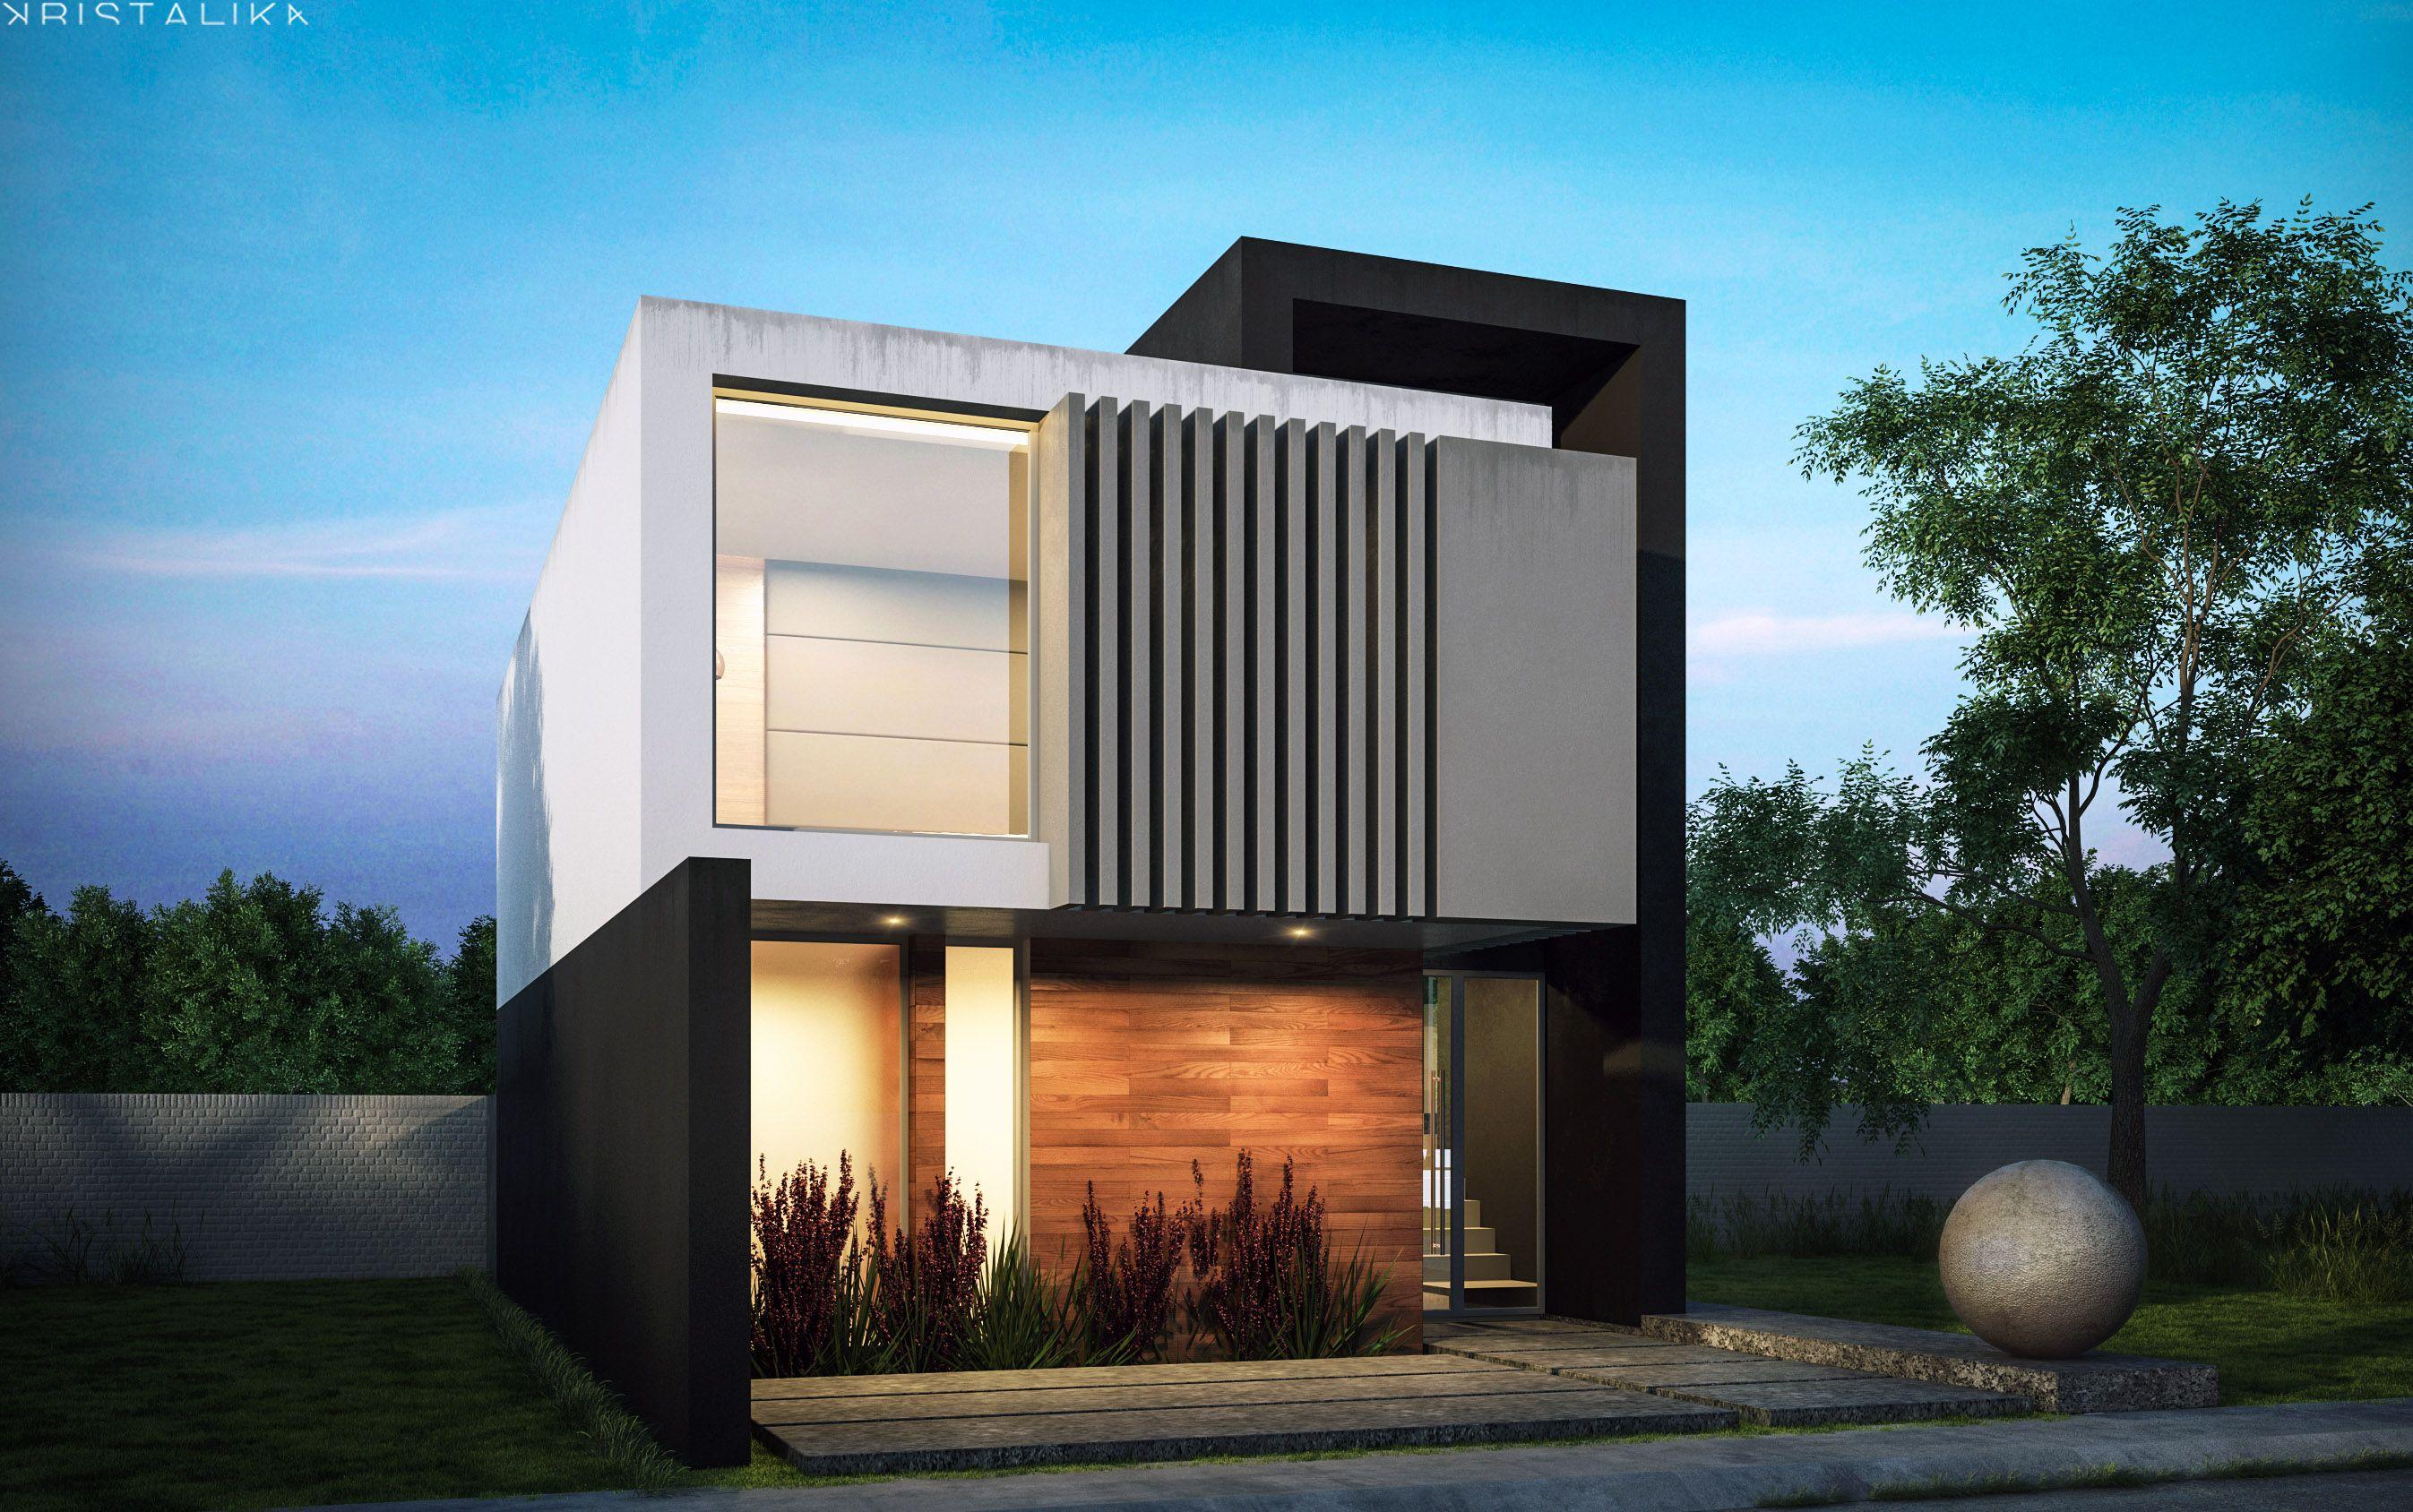 Pin by kristalika on kristalika arquitecture and interior design casas casas modernas - Casa in acciaio prezzo ...